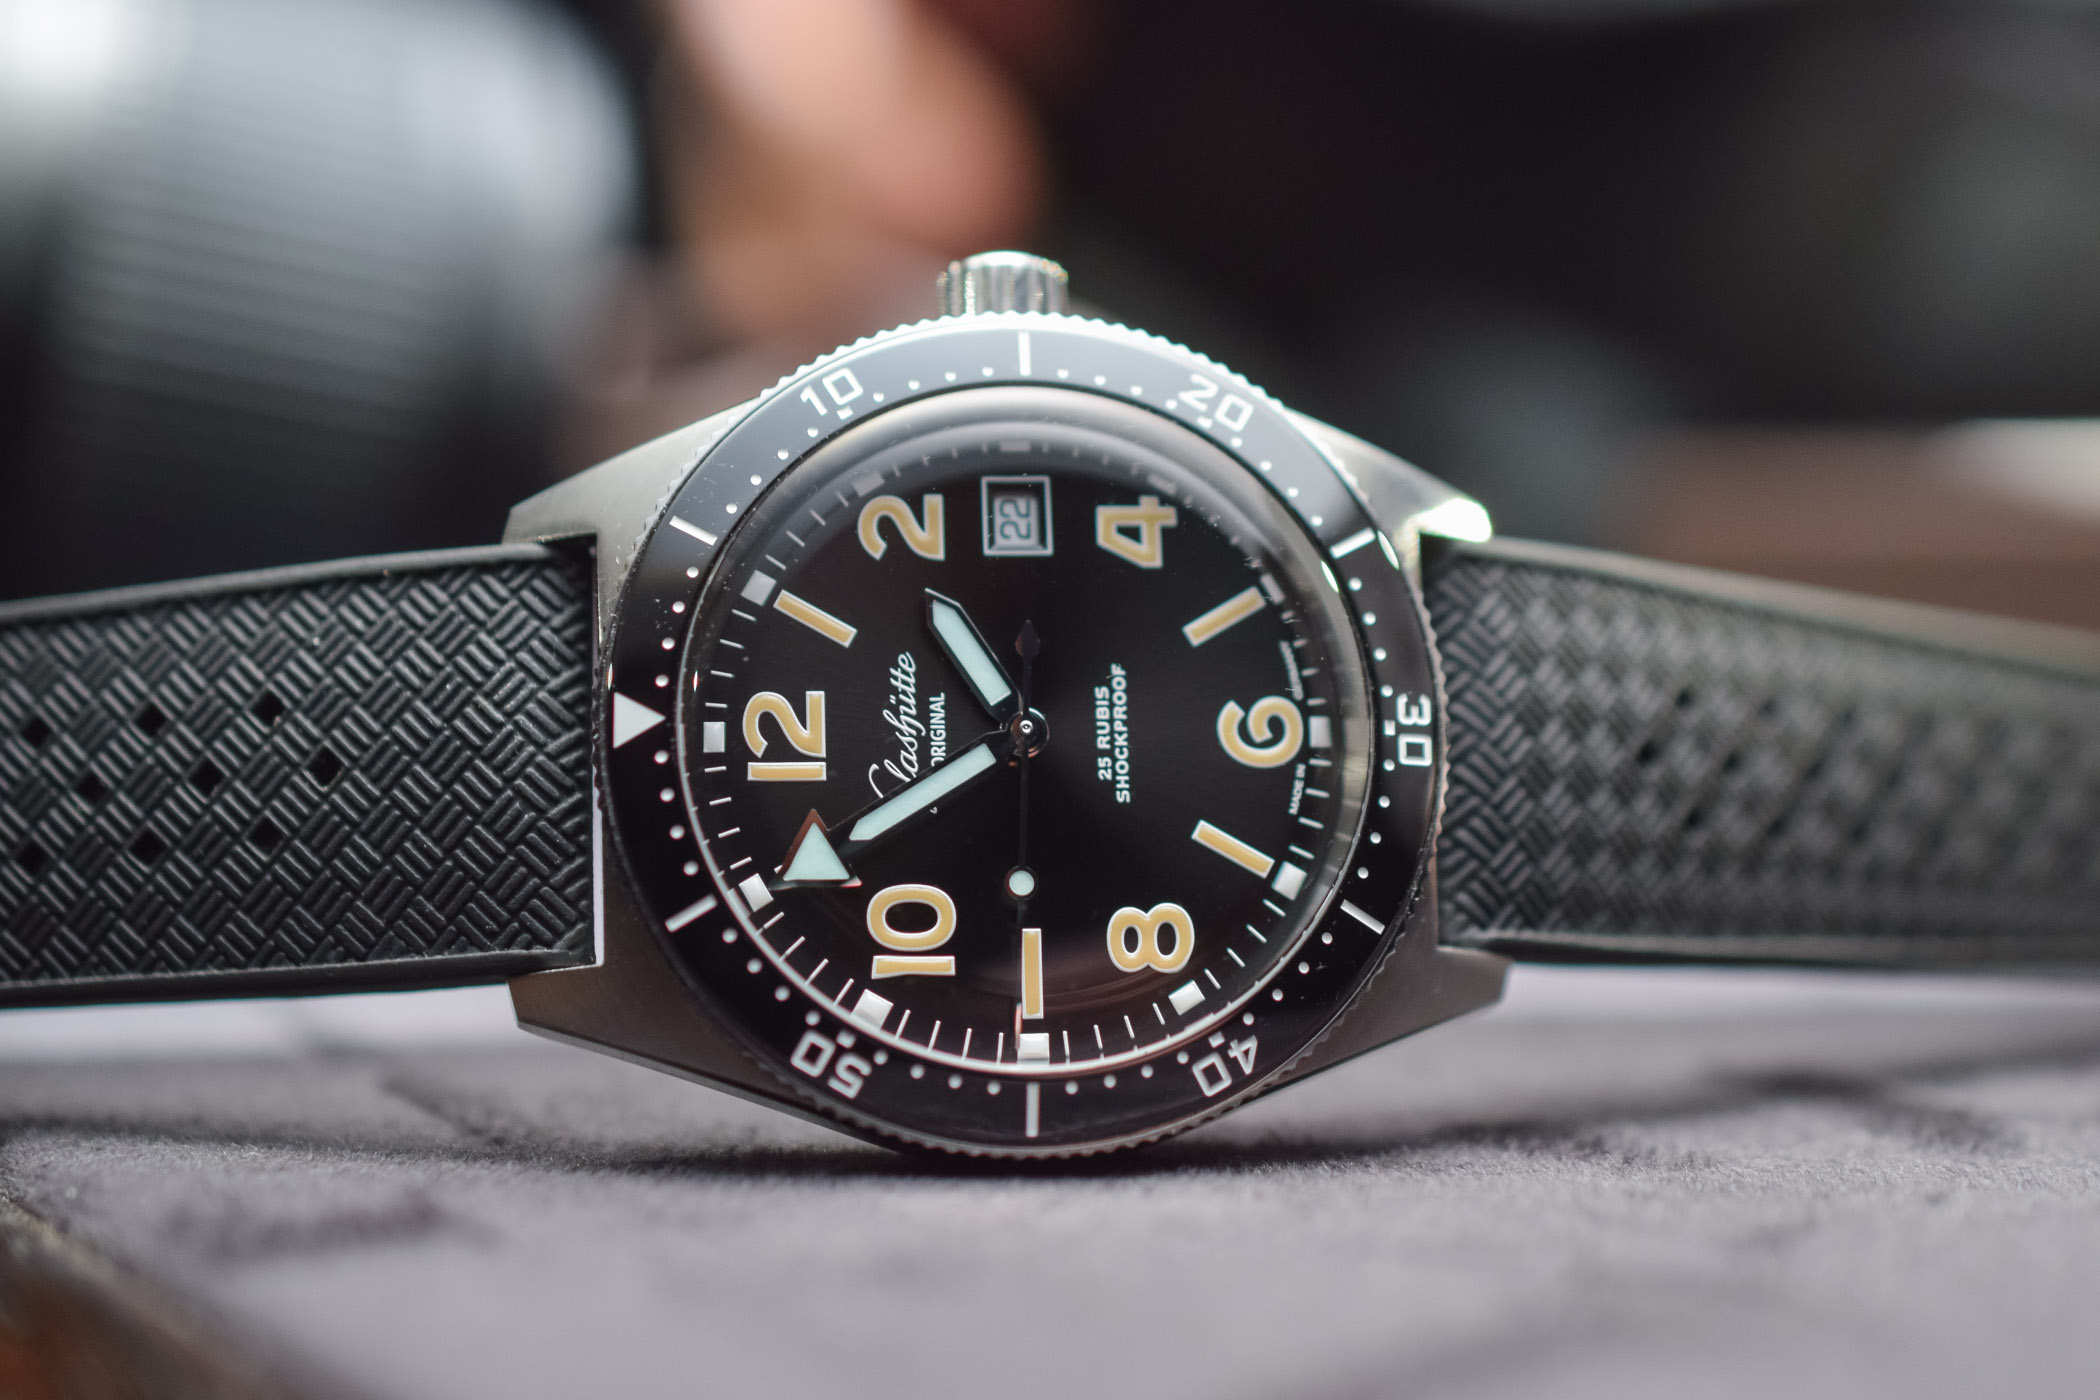 Glashutte Original SeaQ 1969 Limited Edition Dive Watch - 1